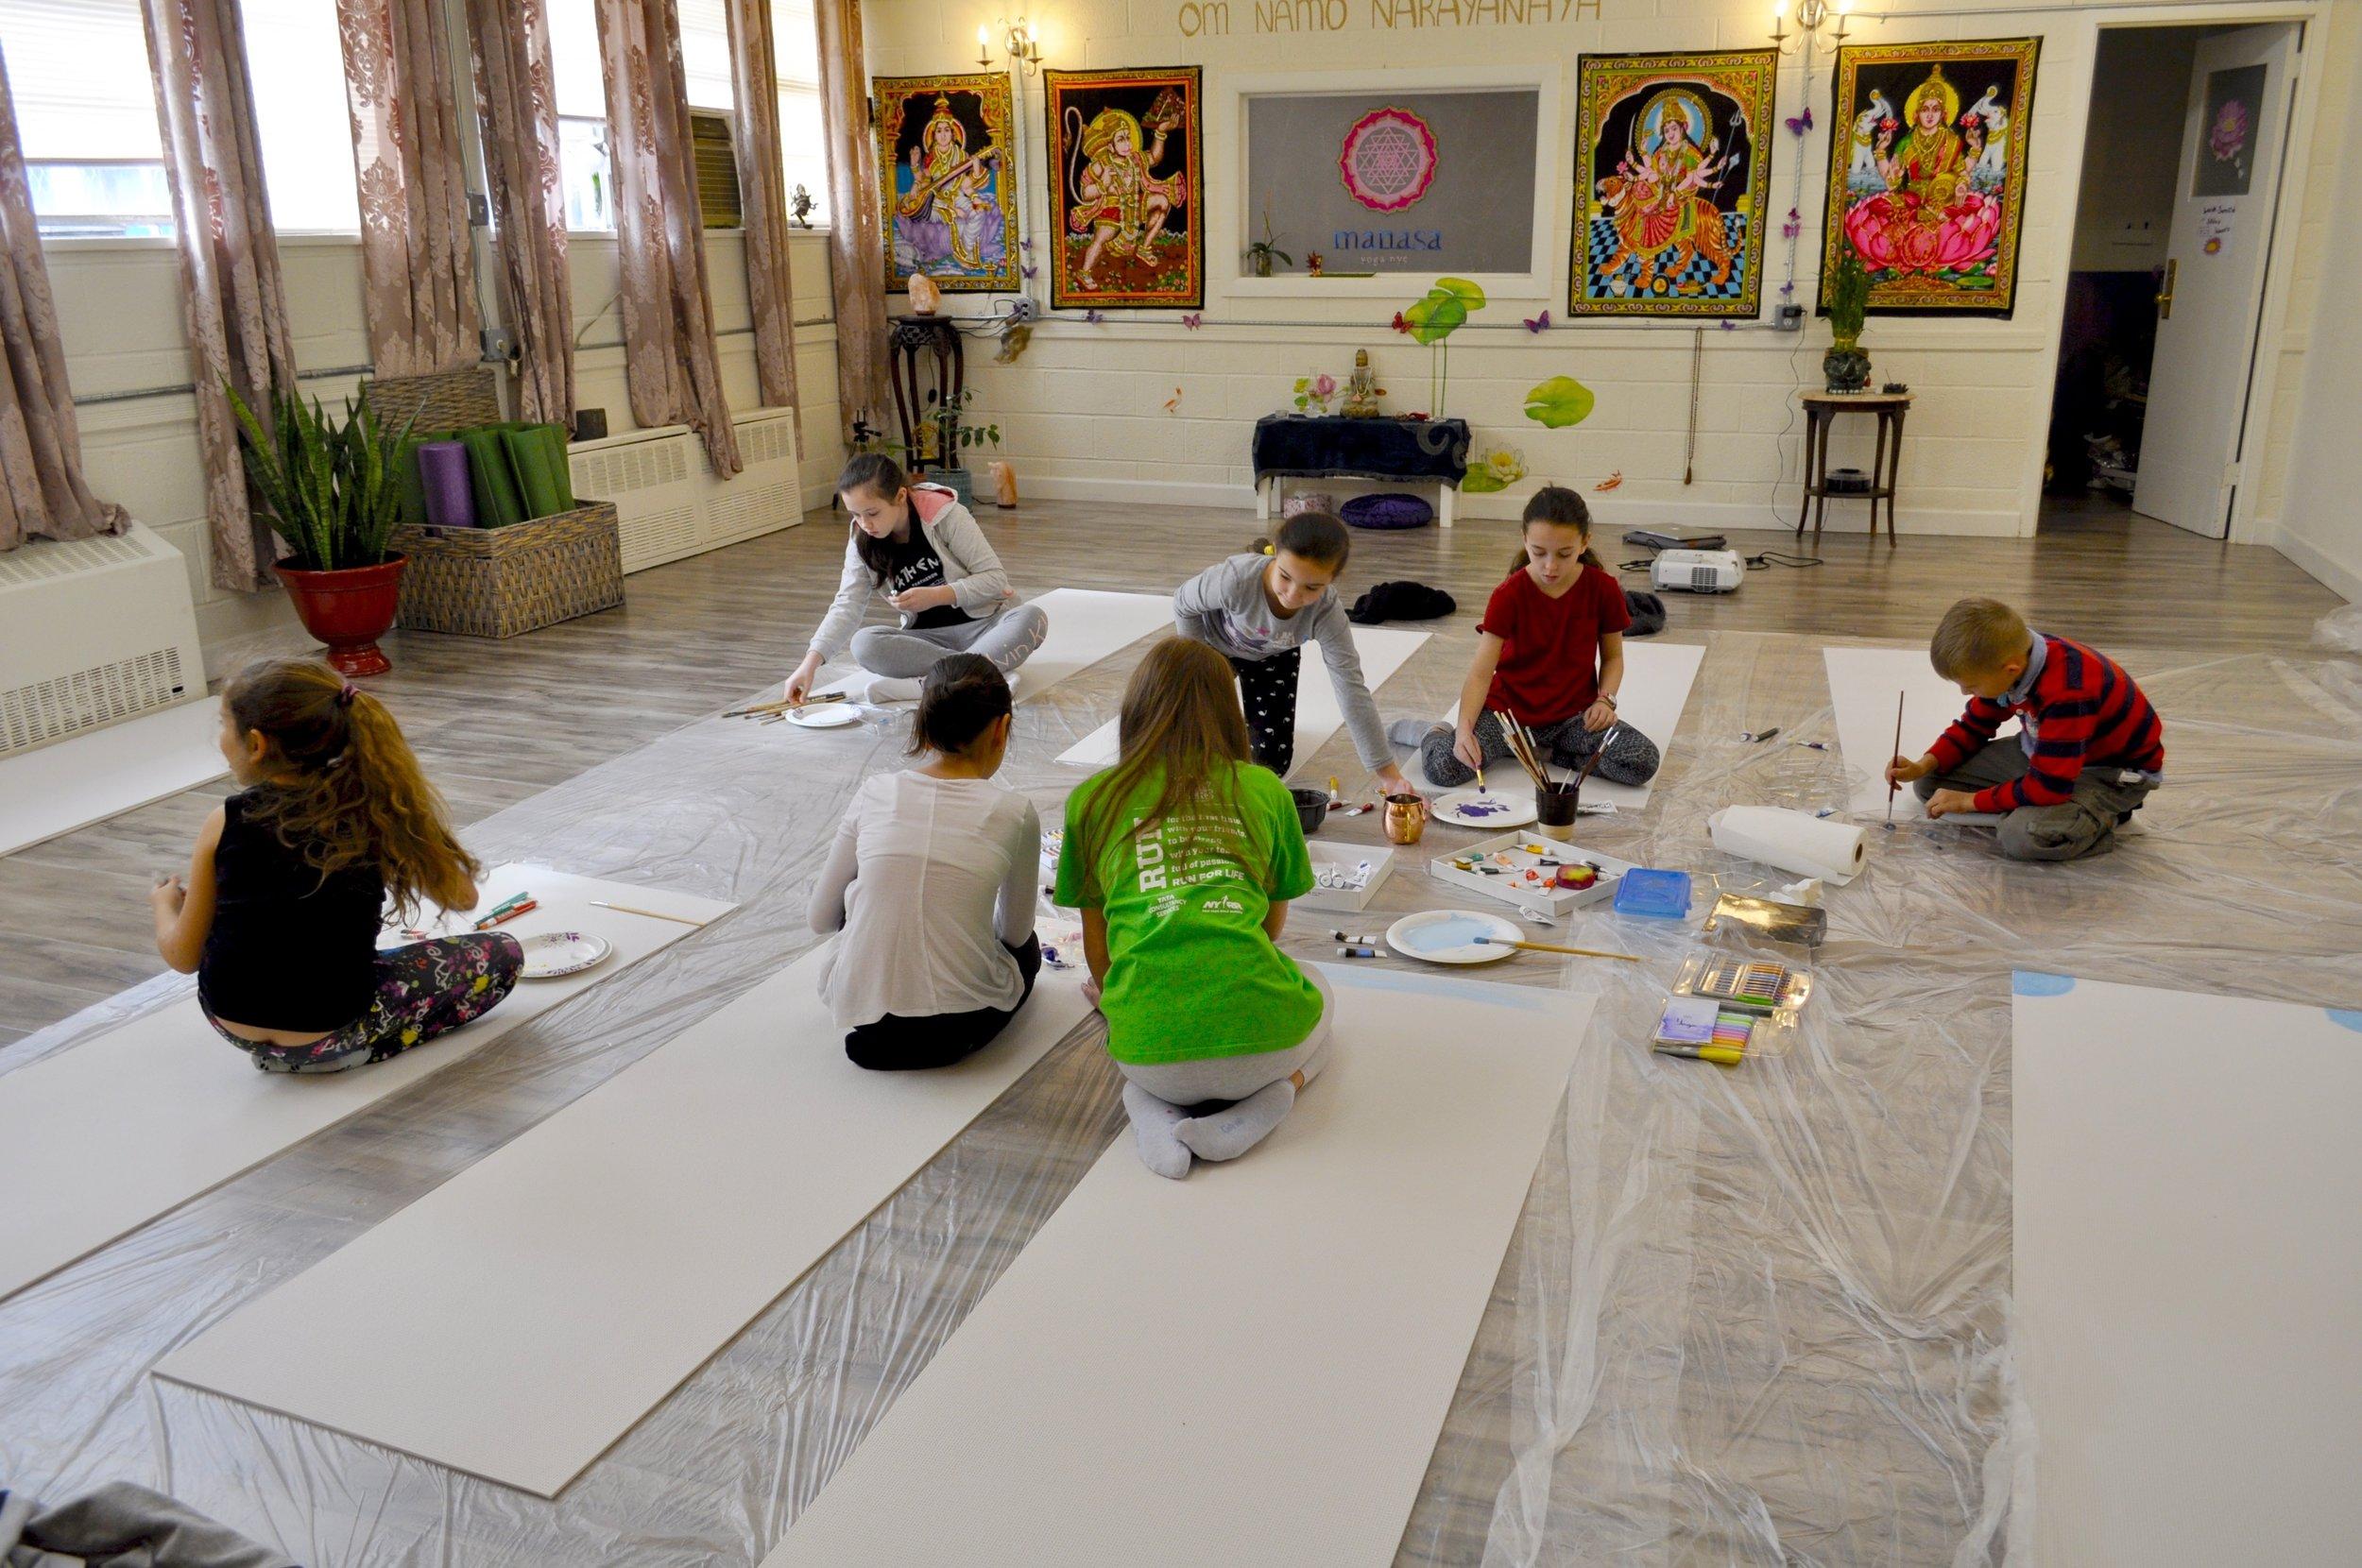 Paint Your Yoga Mat! Workshop with Masha!